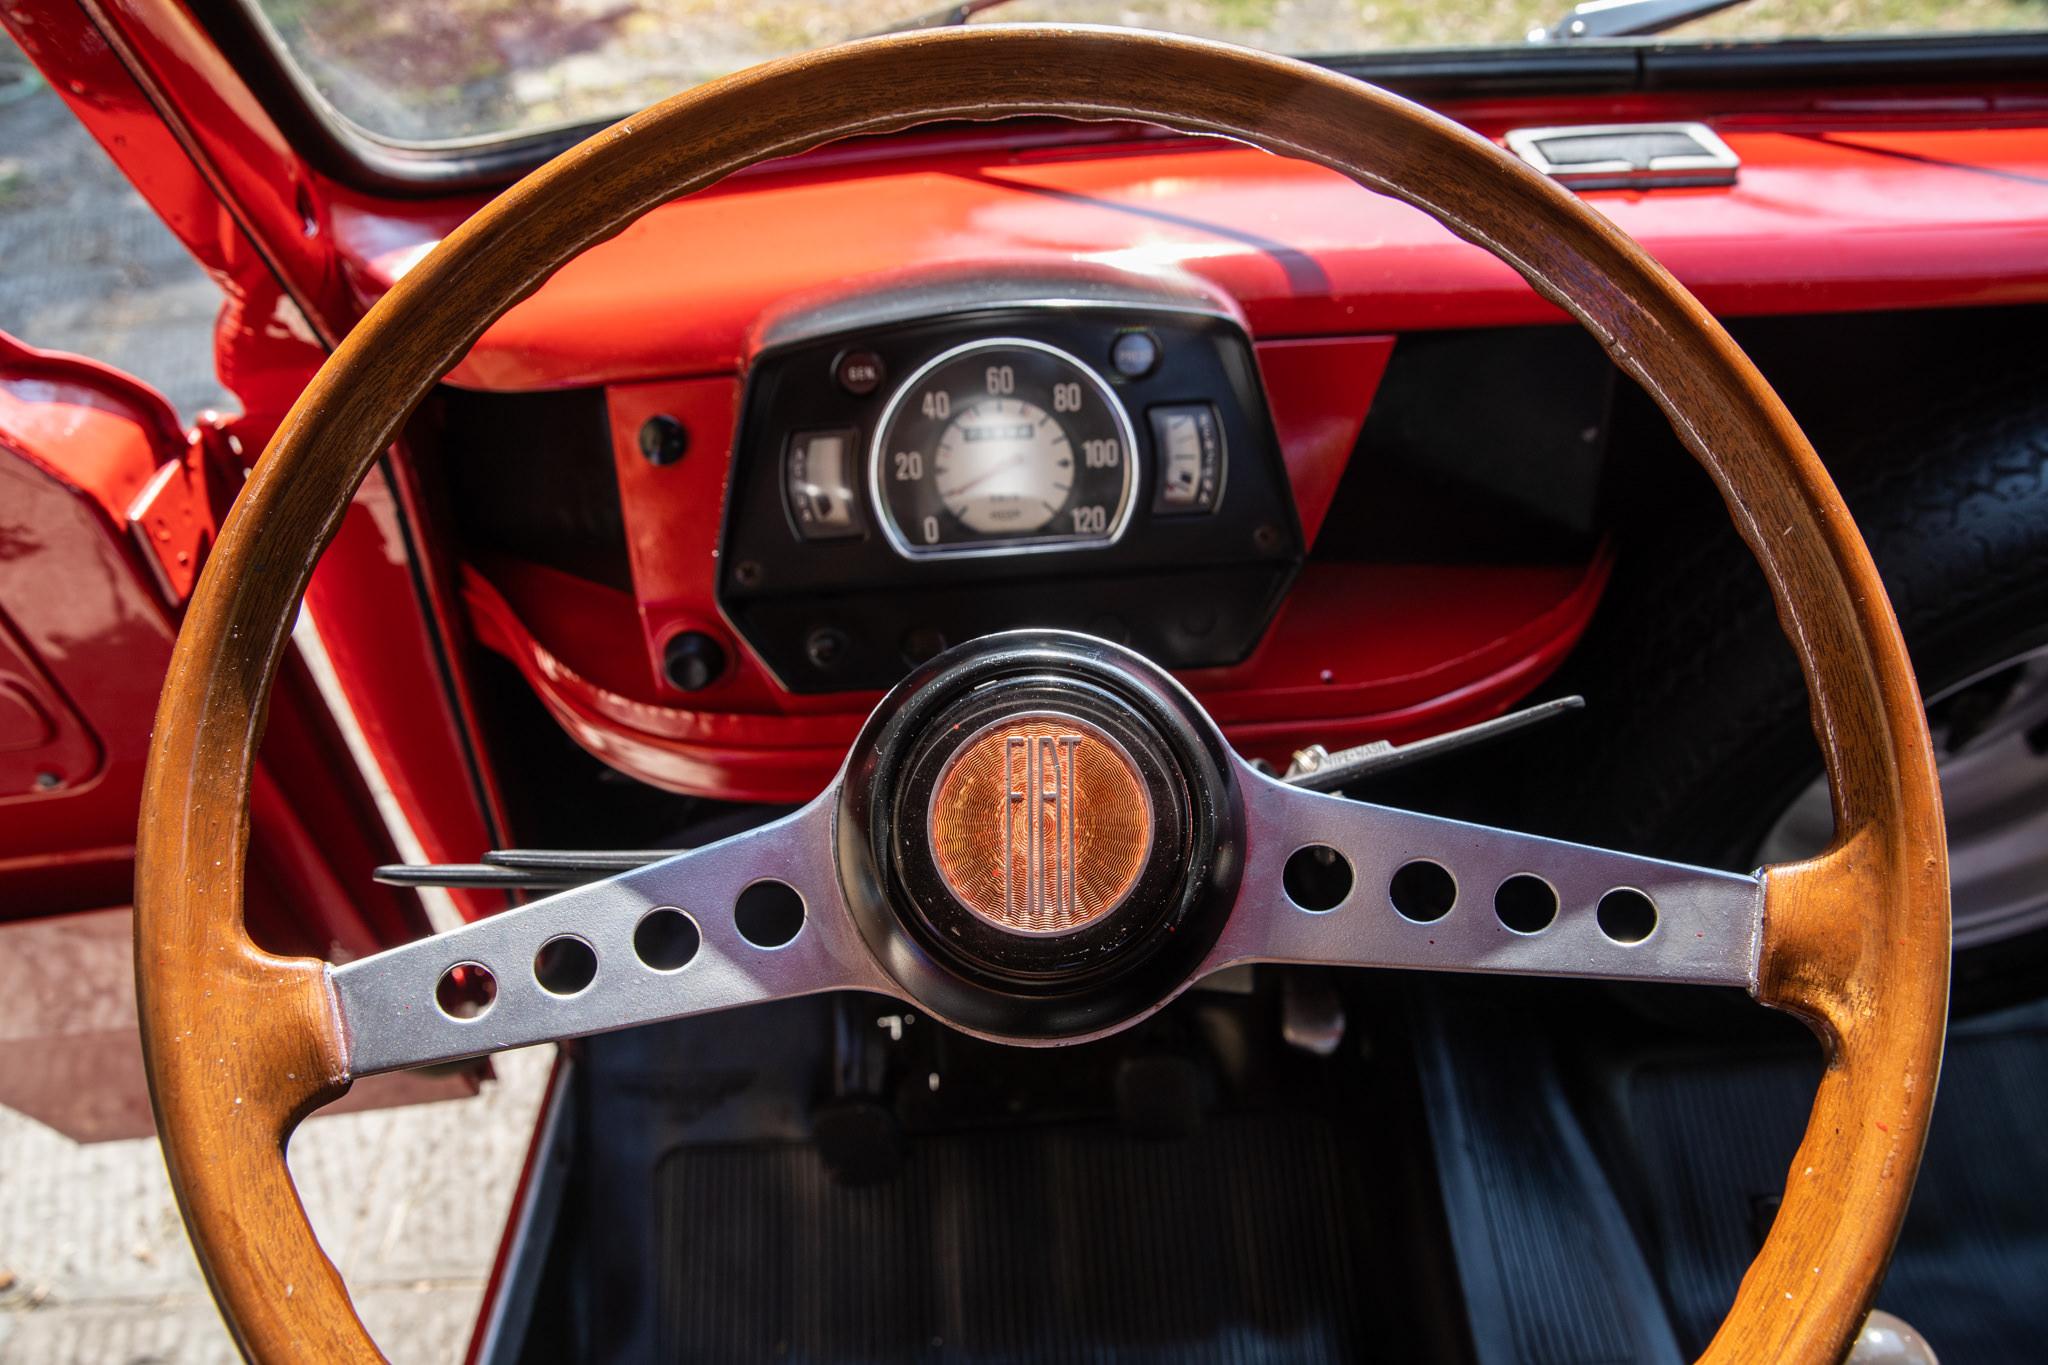 1977 Fiat 900 Coriasco Pickup steering wheel